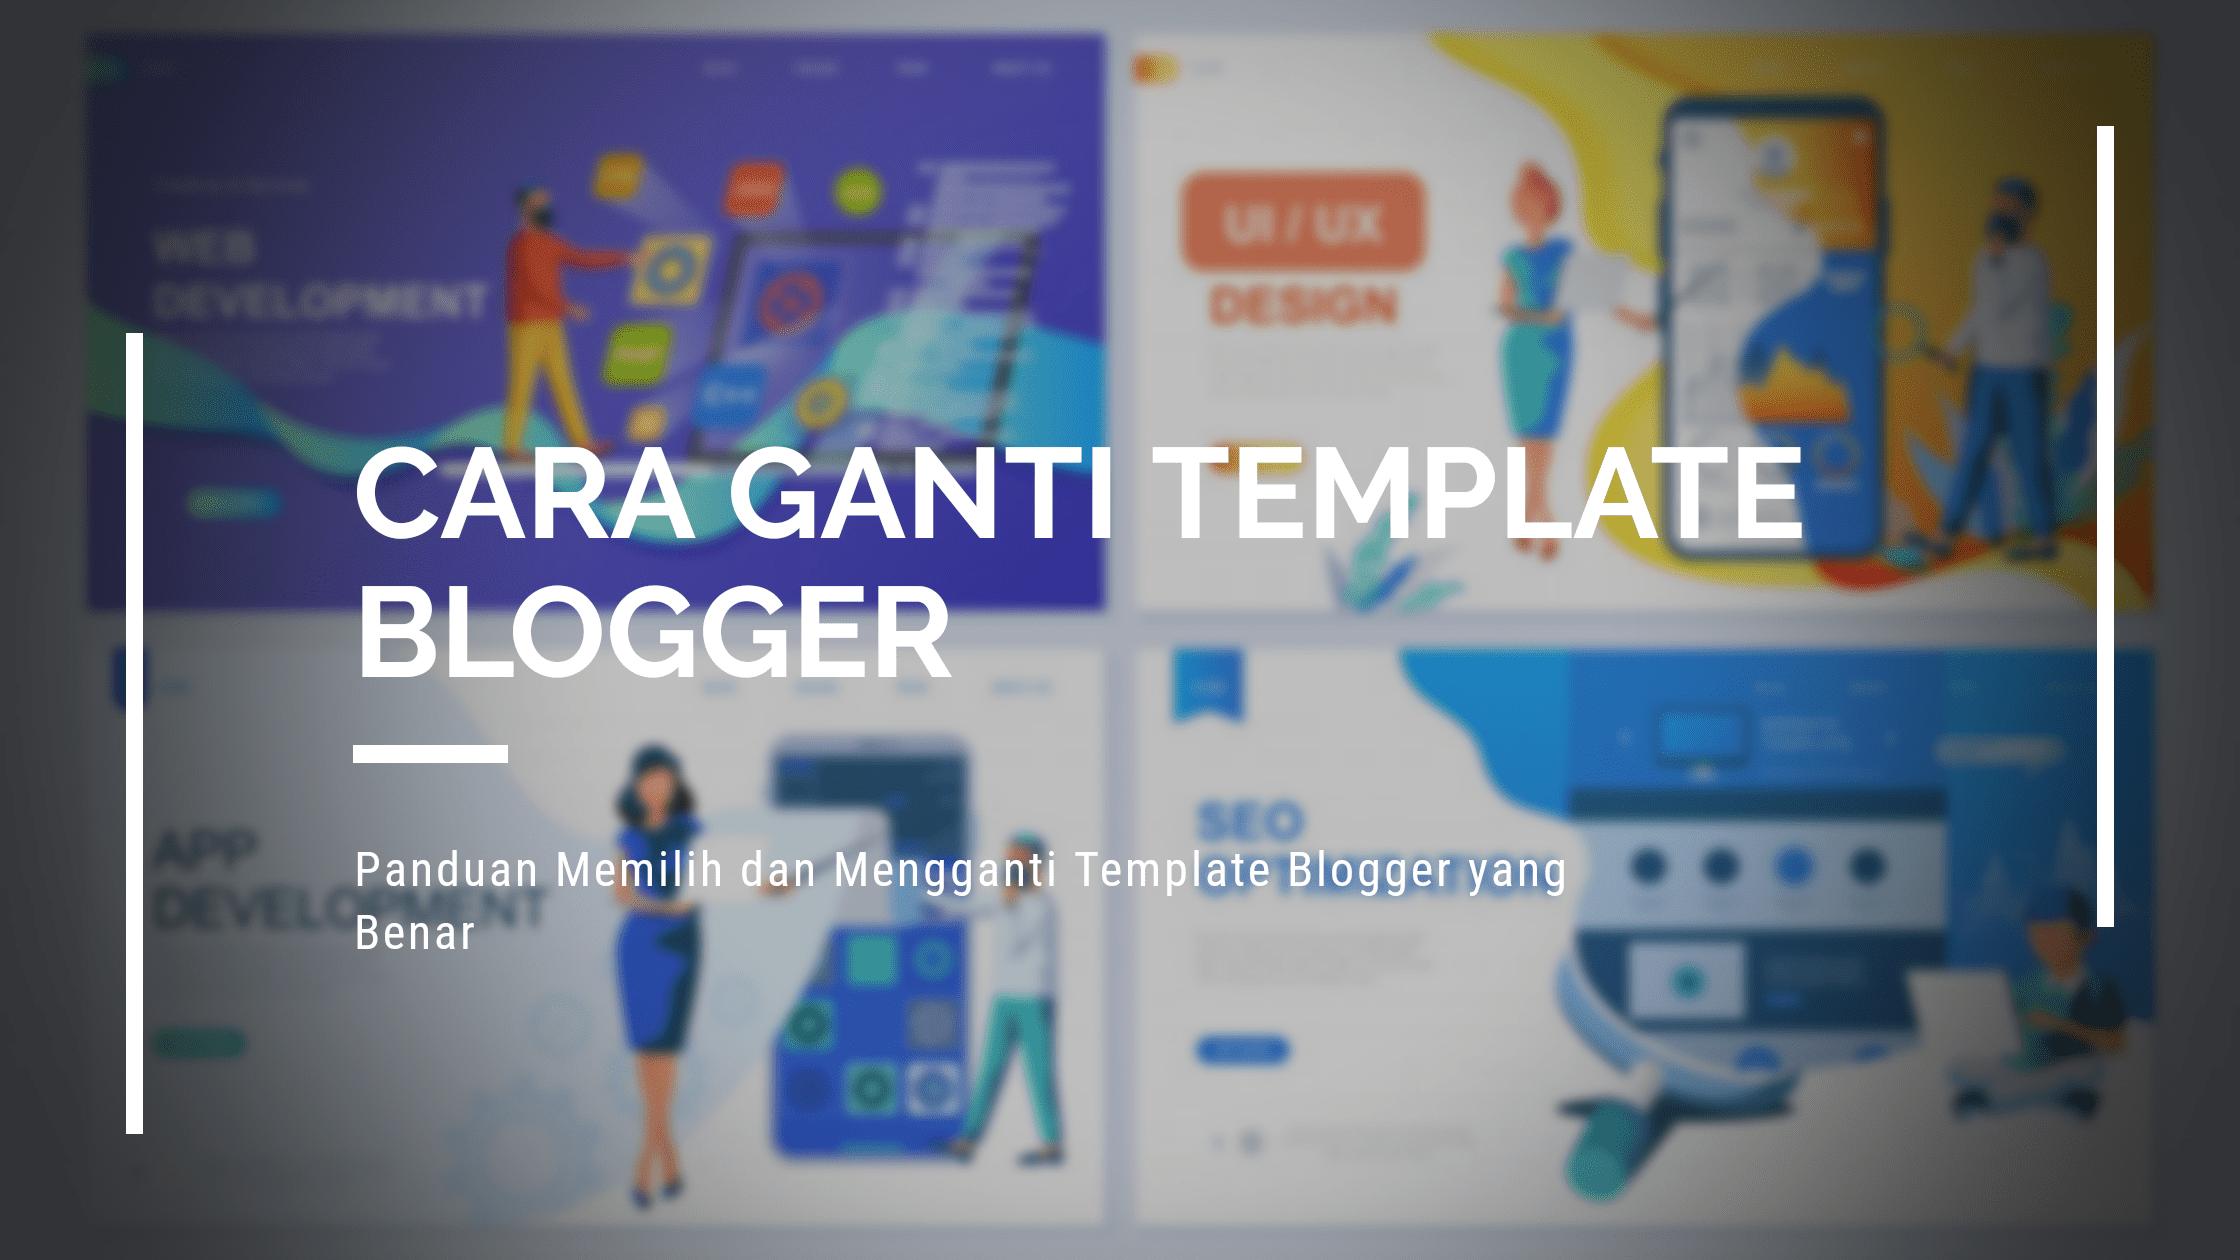 Cara mengganti template blogger terbaru 2020